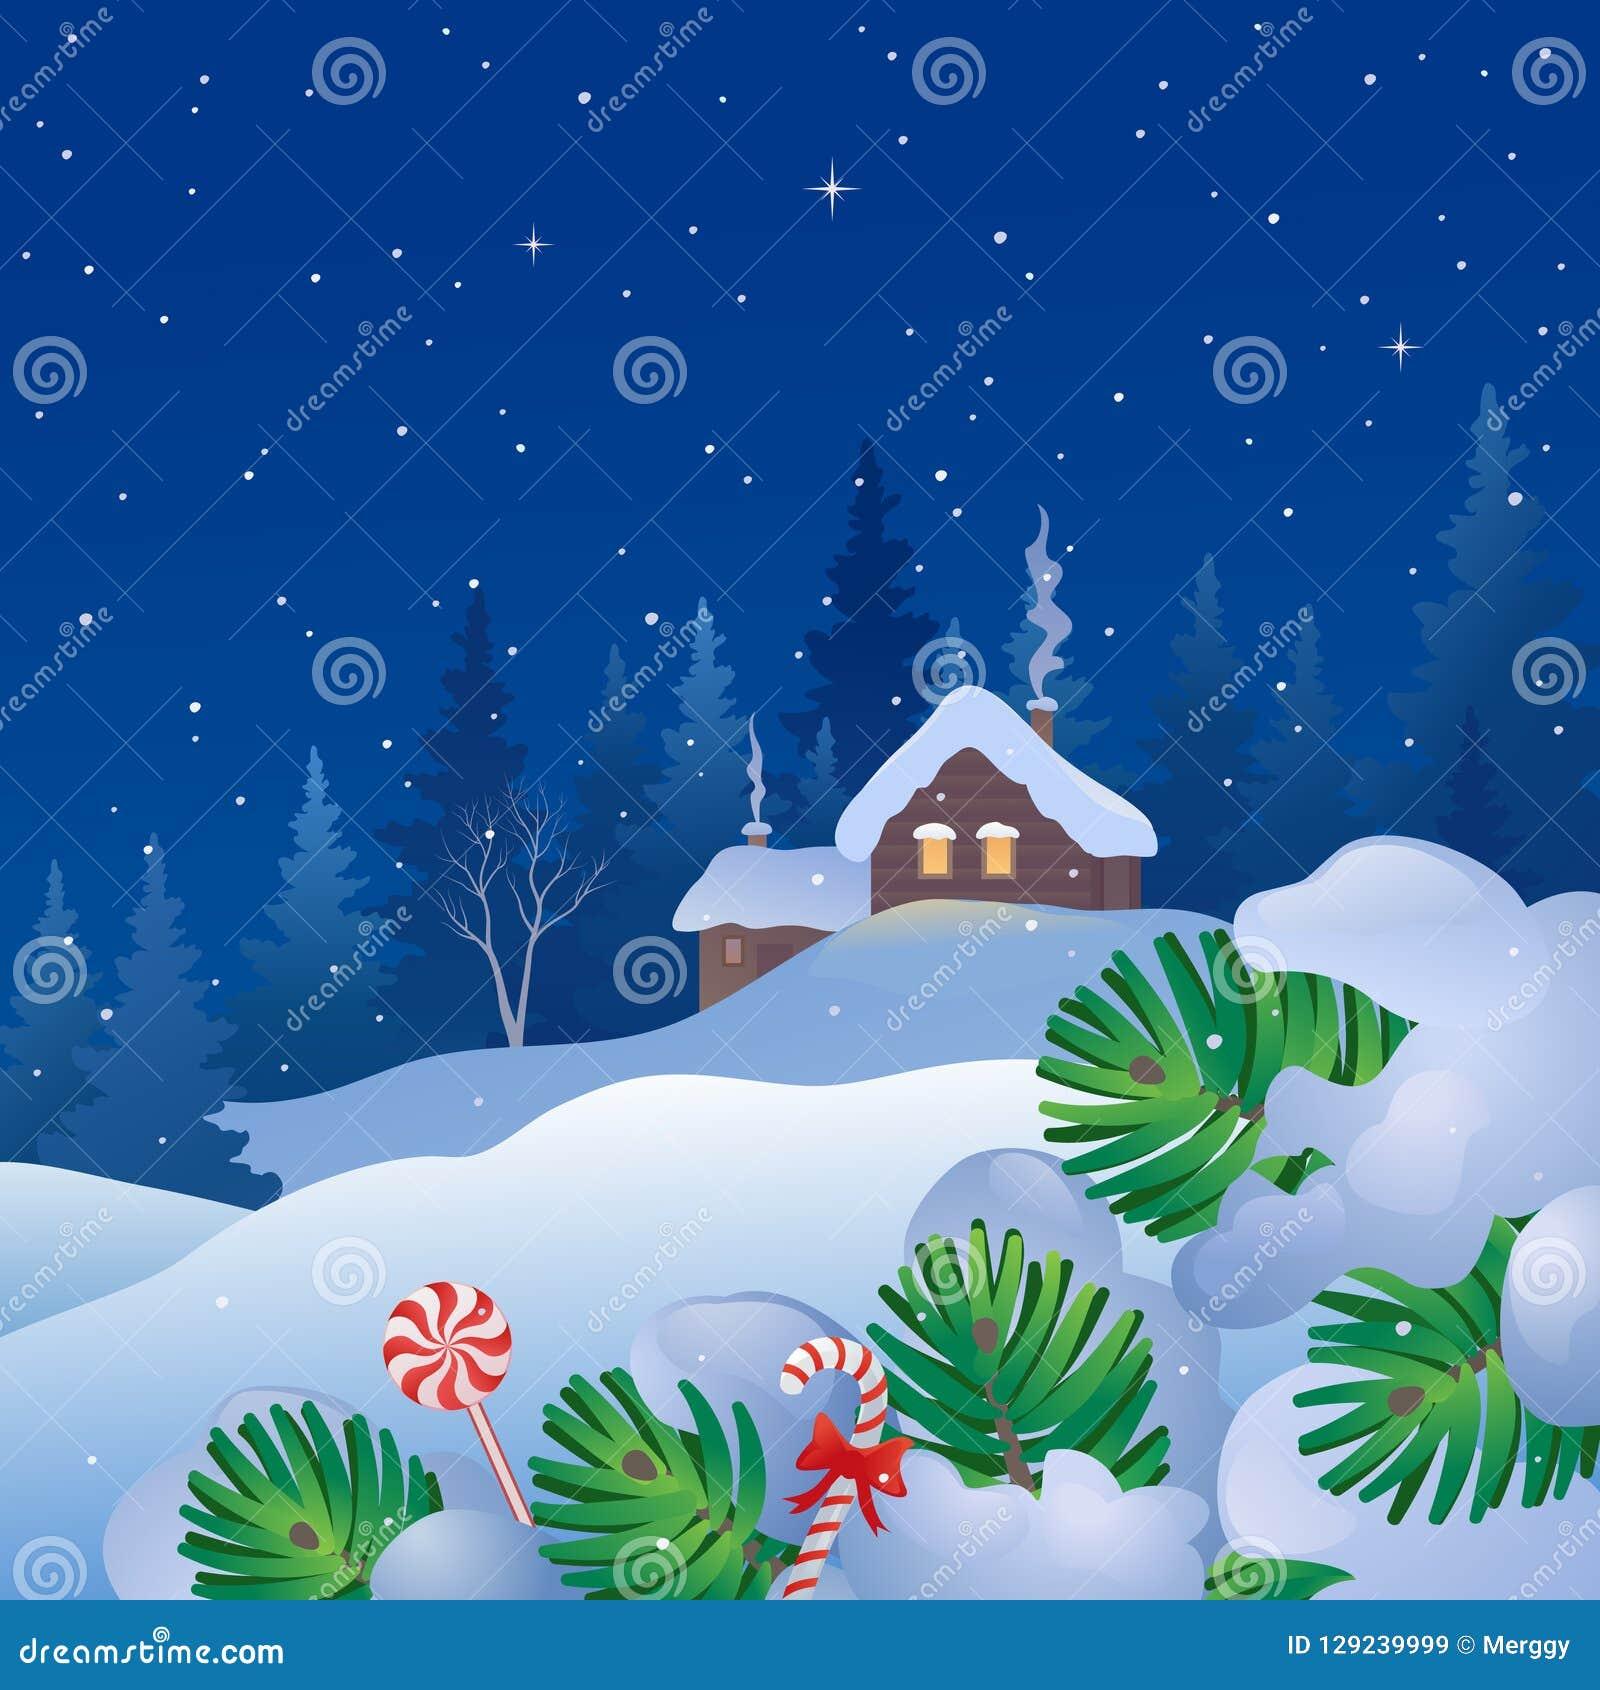 Christmas Eve Snowfall Stock Vector Illustration Of Village 129239999